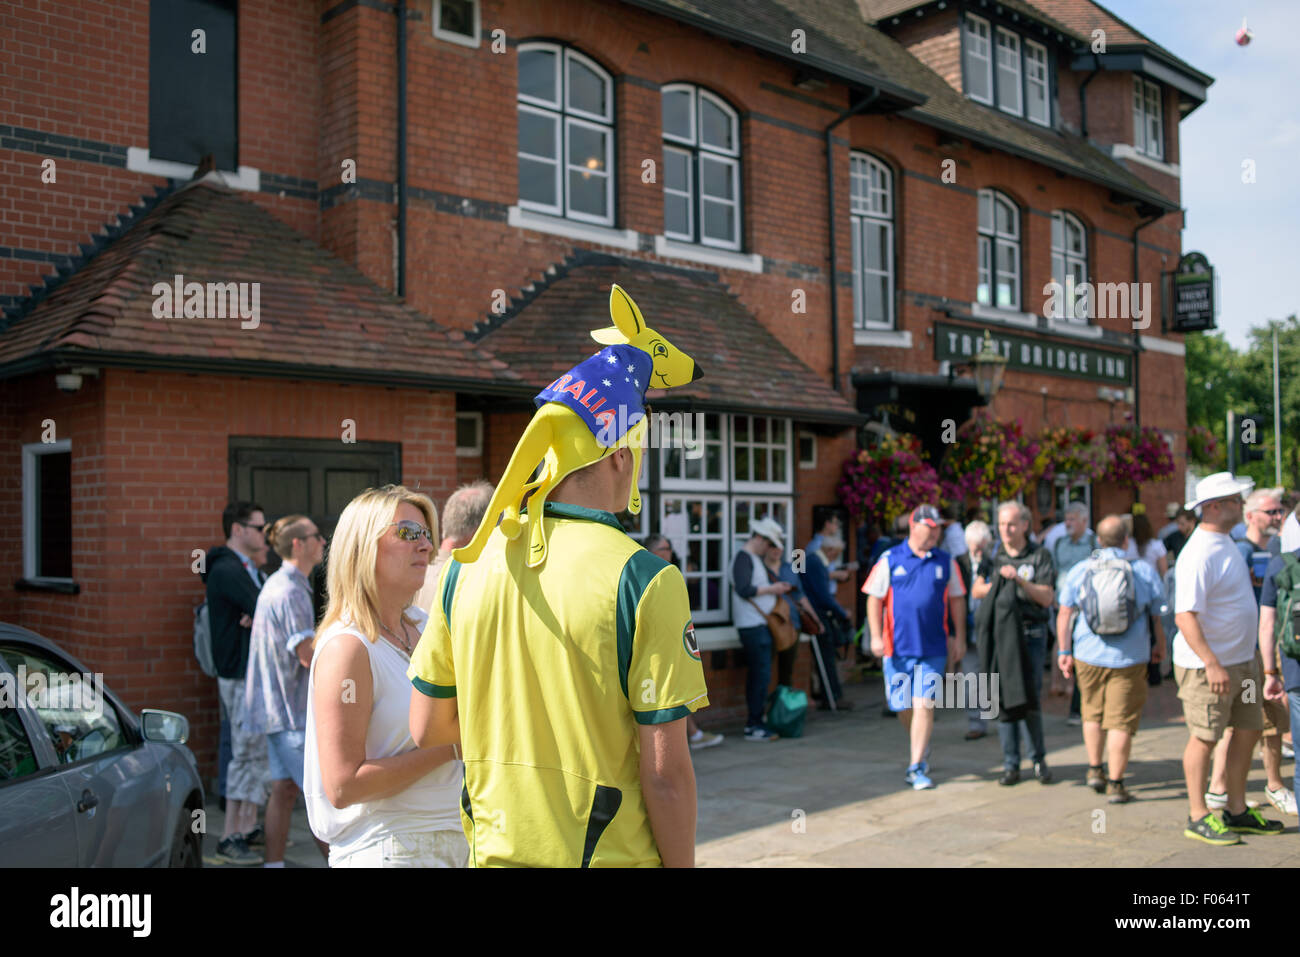 Trent Bridge, Nottingham, UK. 8th Aug, 2015.England and Australian cricket fans arriving at Trent Bridge ahead of Stock Photo